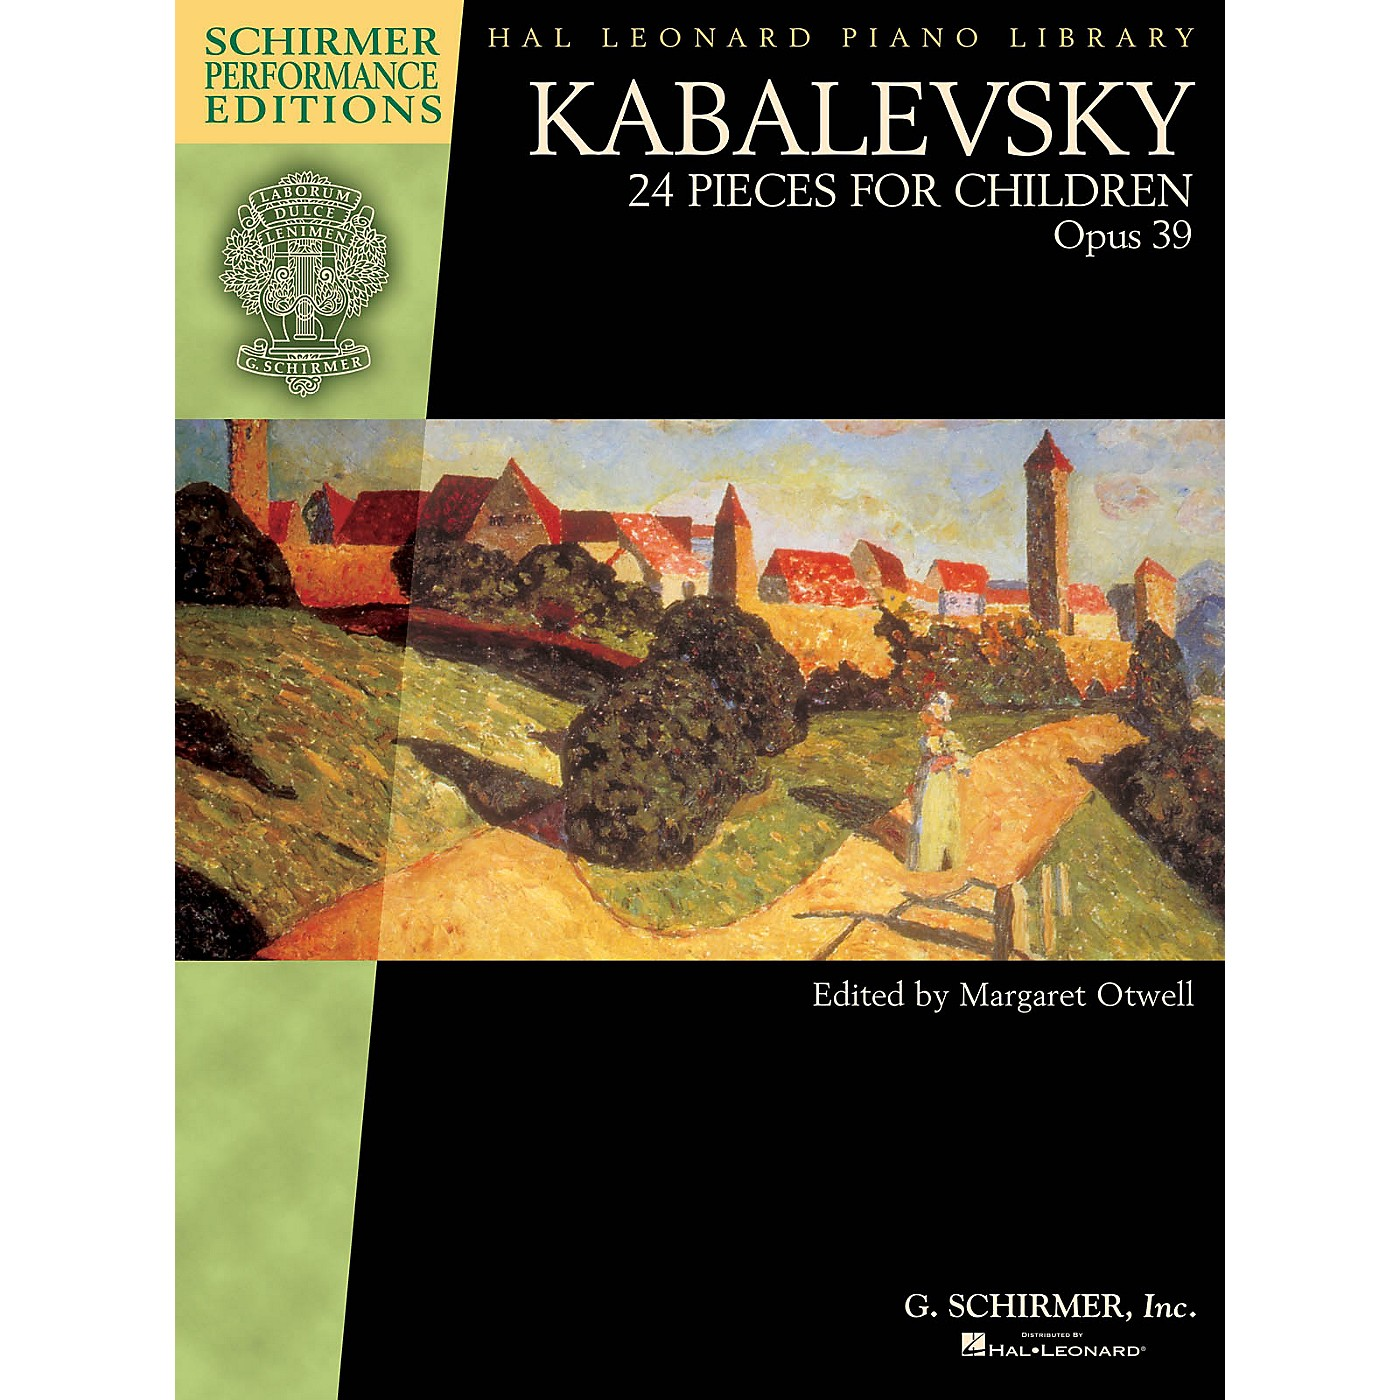 G. Schirmer Kabalevsky - 24 Pieces for Children, Opus 39 Schirmer Performance Editions by Kabalevsky Edited by Otwell thumbnail